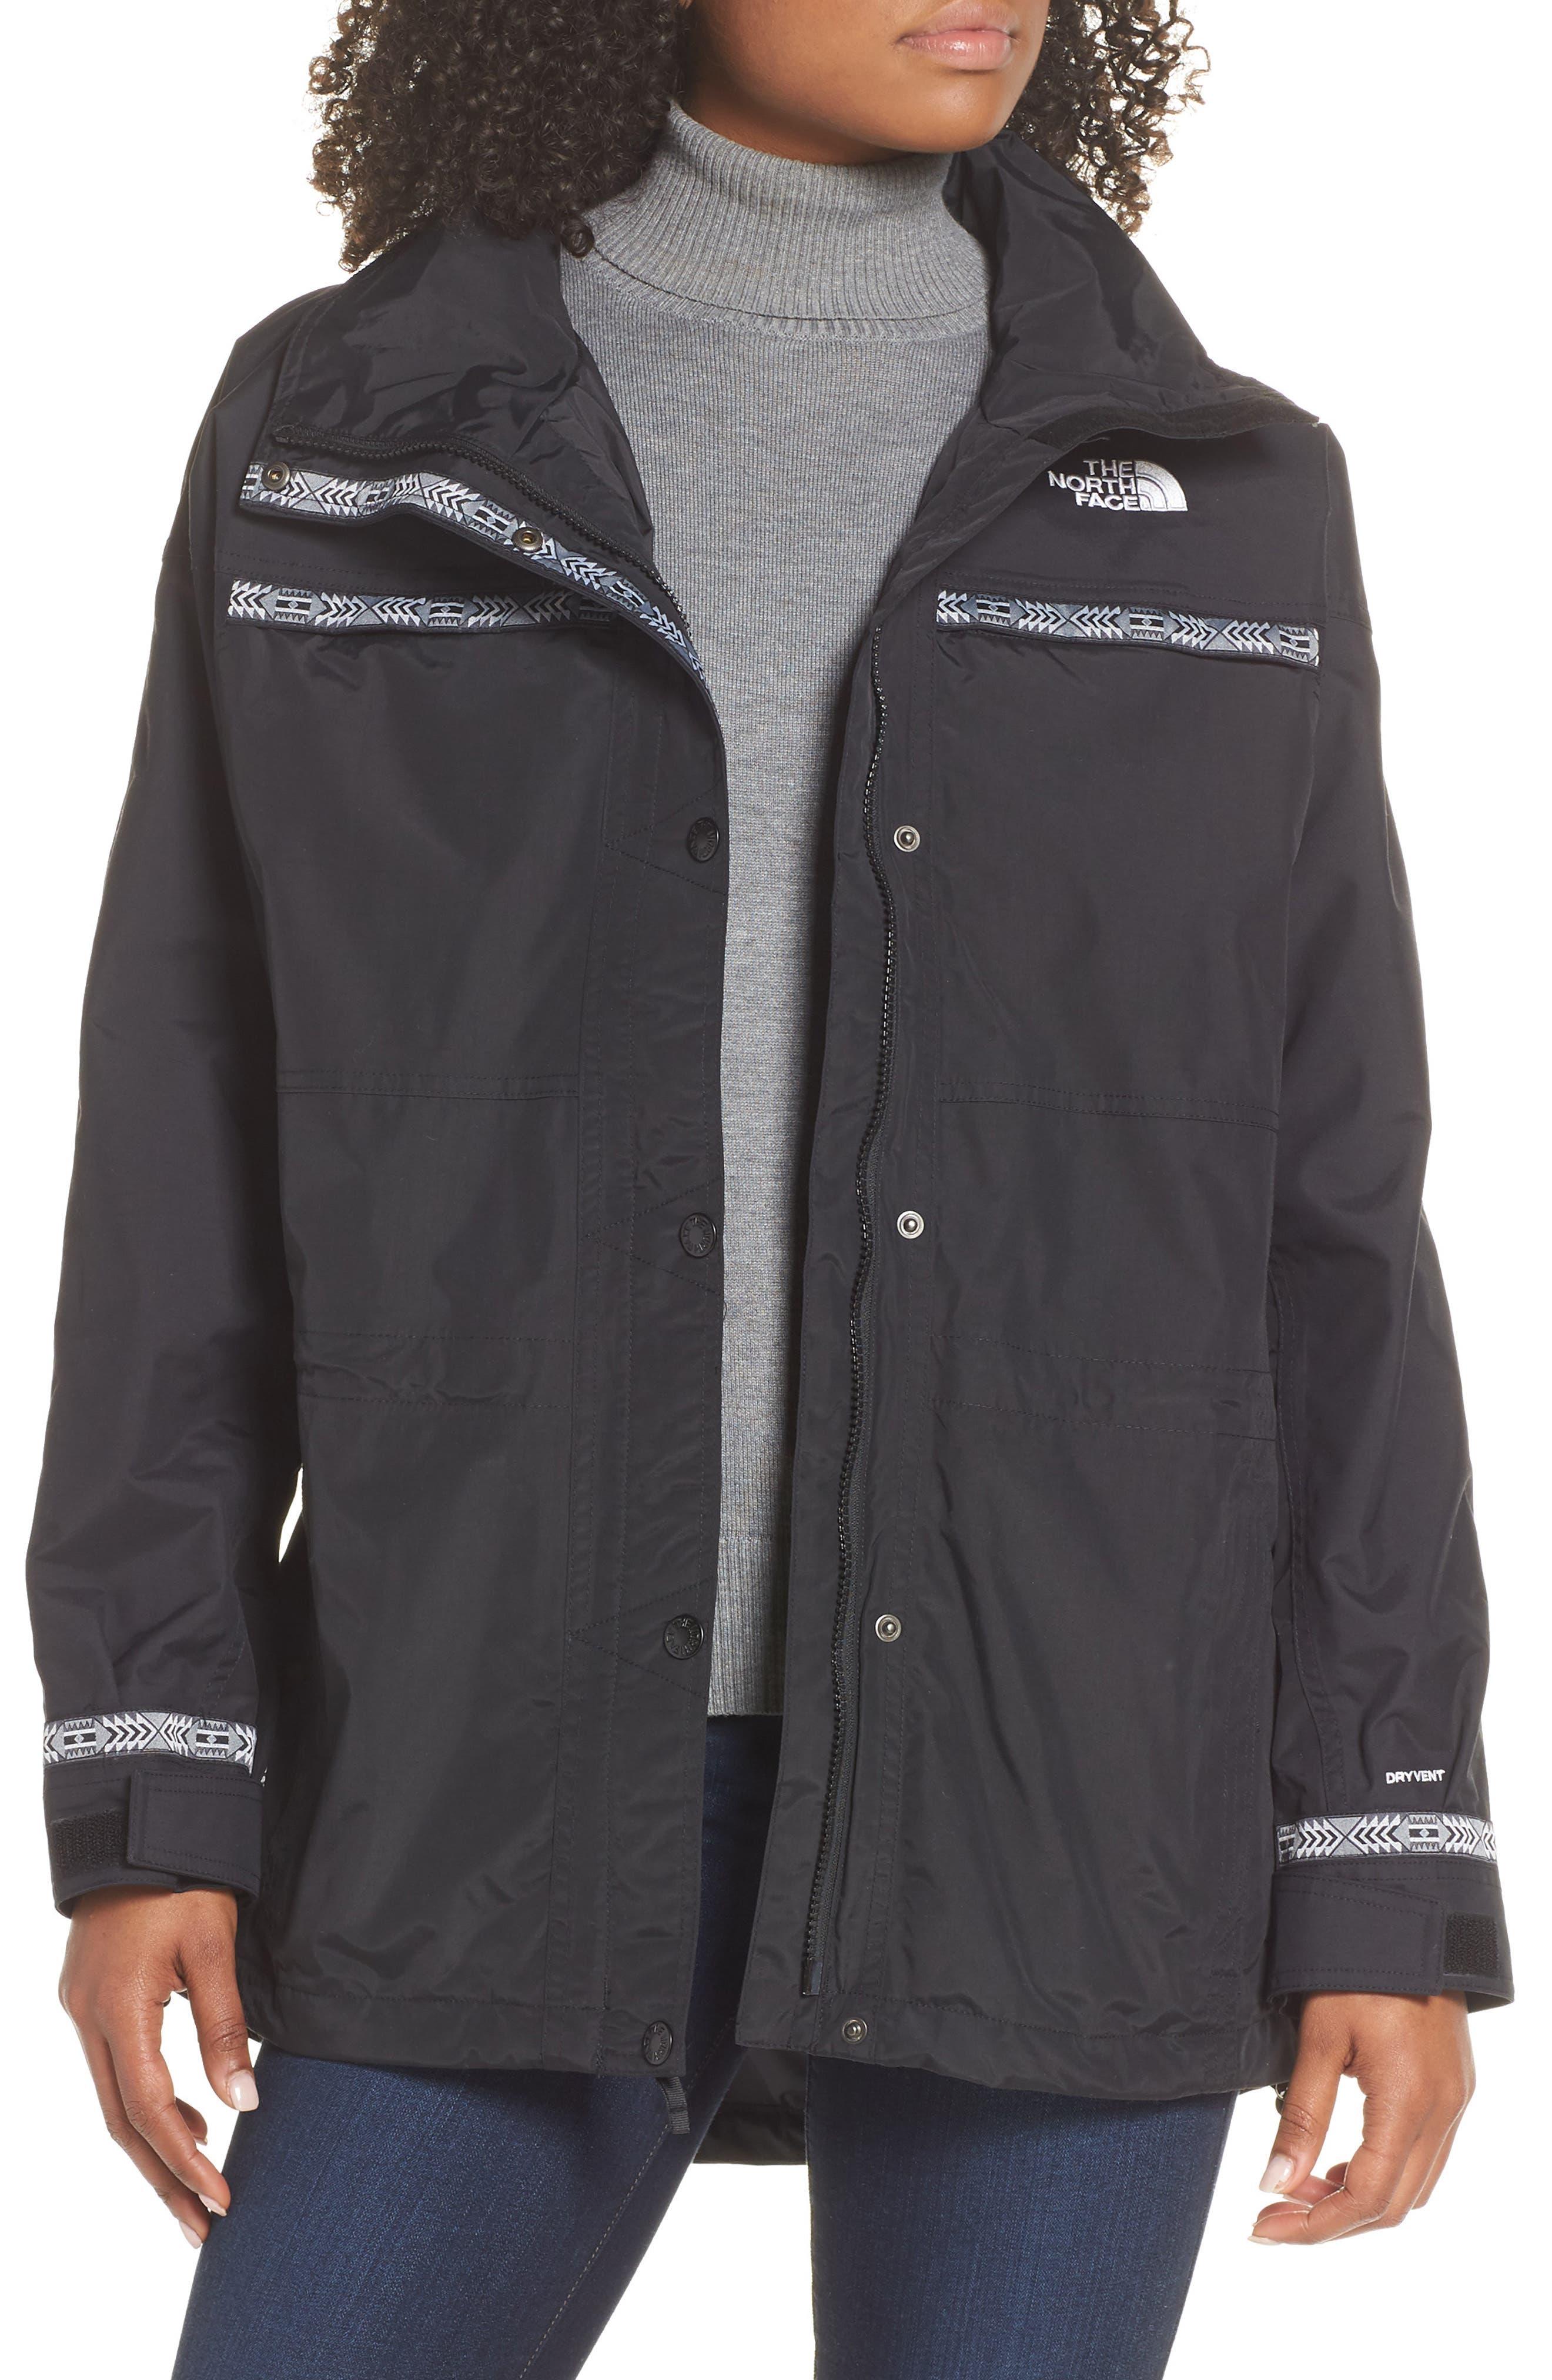 e61a559202d6 Women s Hooded Rain Coats   Jackets